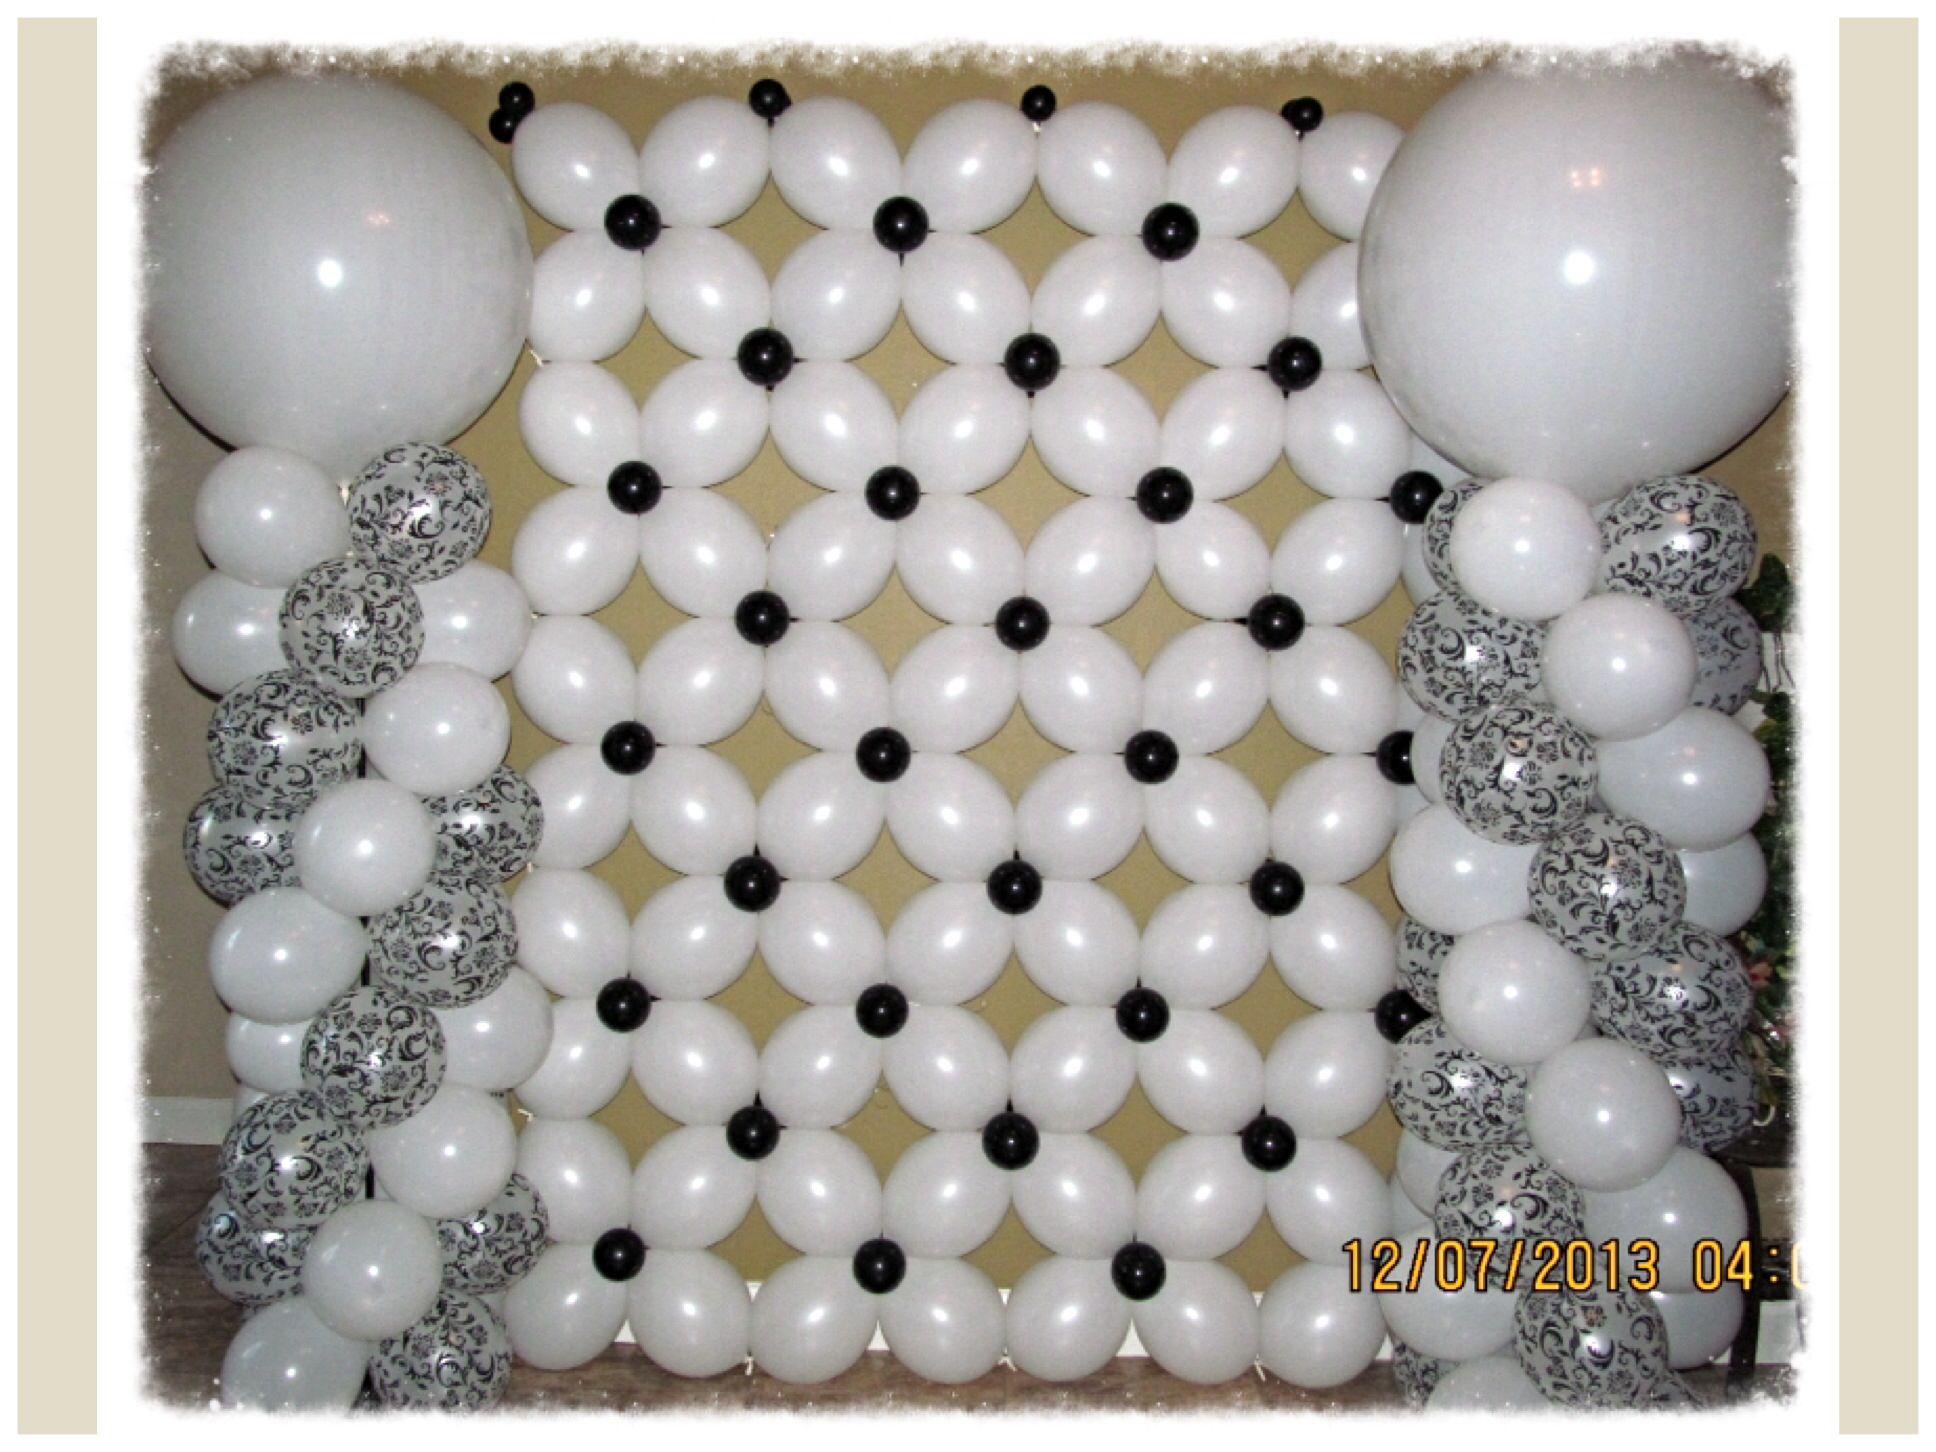 Black And White Balloon Wall And Columns Nyc Balloon